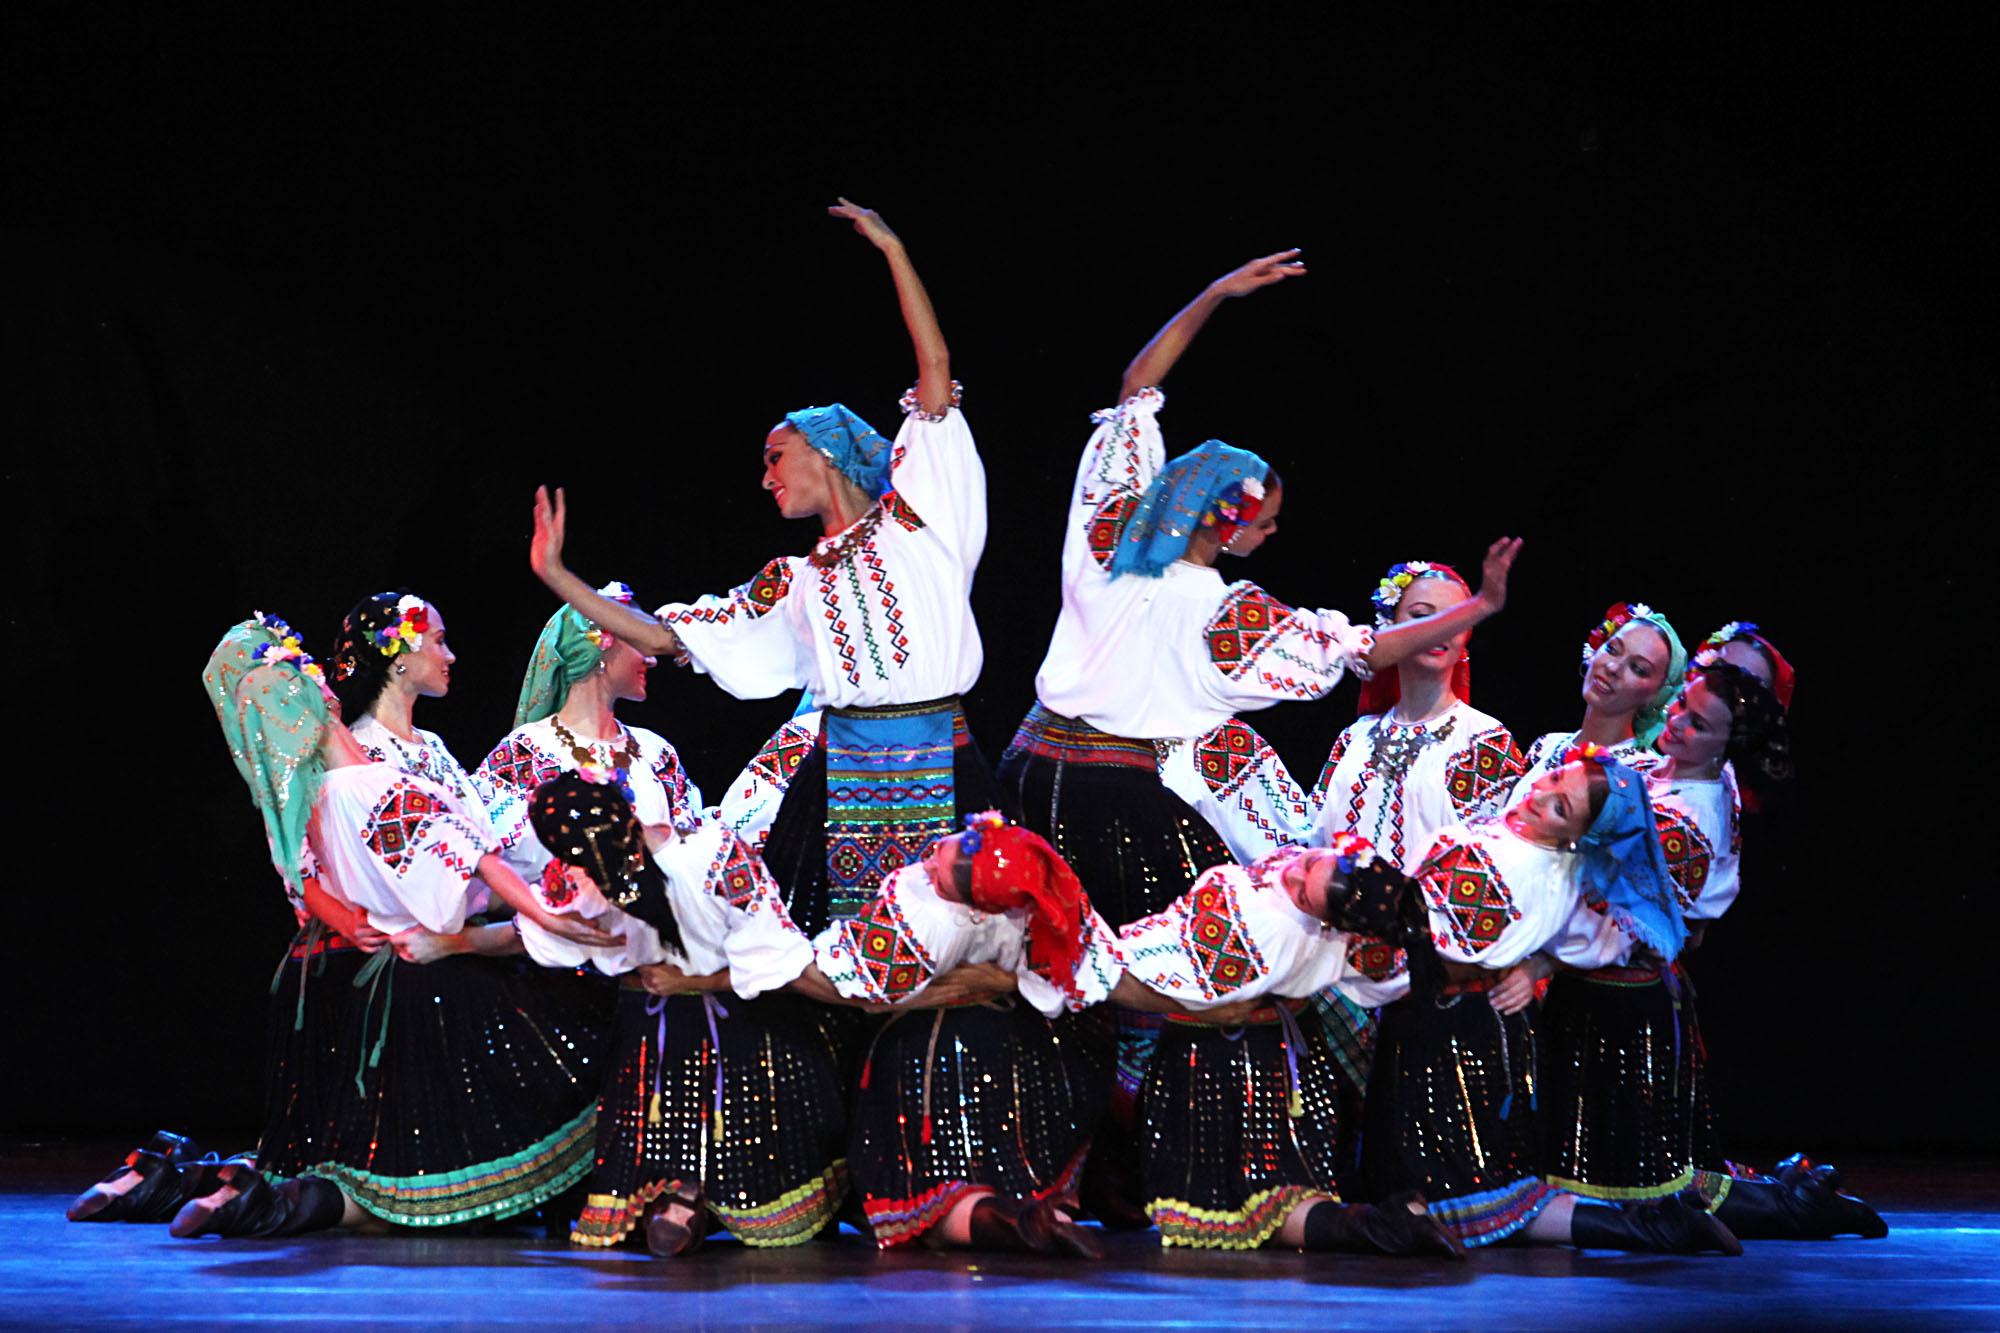 Selain menampilkan tarian-tarian Rusa, pada penampilan di Jakarta, Igor Moiseyev Ballet menampilkan tarian dari Yunani, Uzbekistan, Meksiko, dan Argentina.